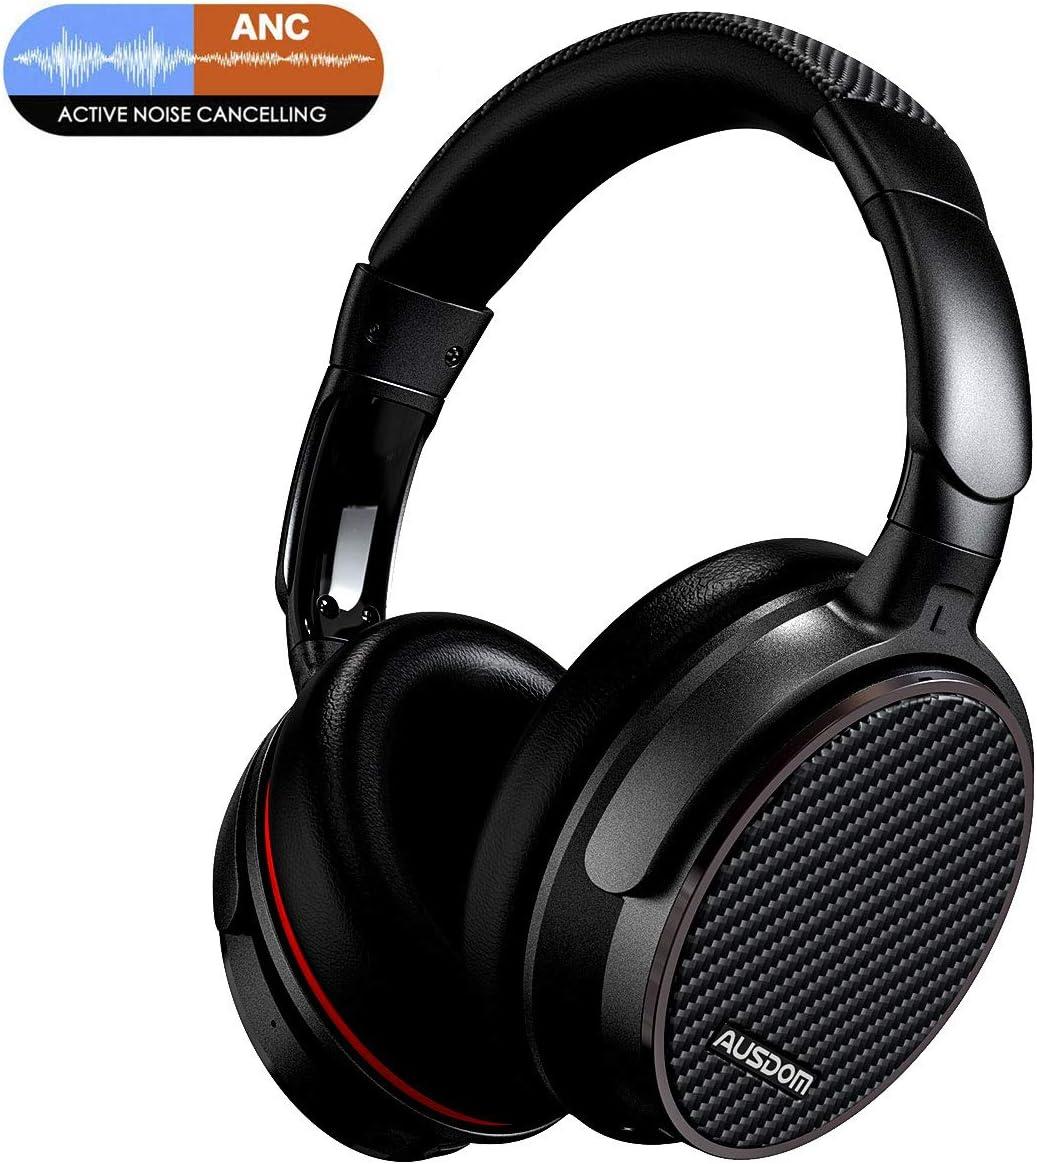 Ausdom ANC7 Auriculares Bluetooth 4.0 con cancelación de ruido activa (micrófono incorporado, batería litio recargable de 500 mAh, negro y rojo)